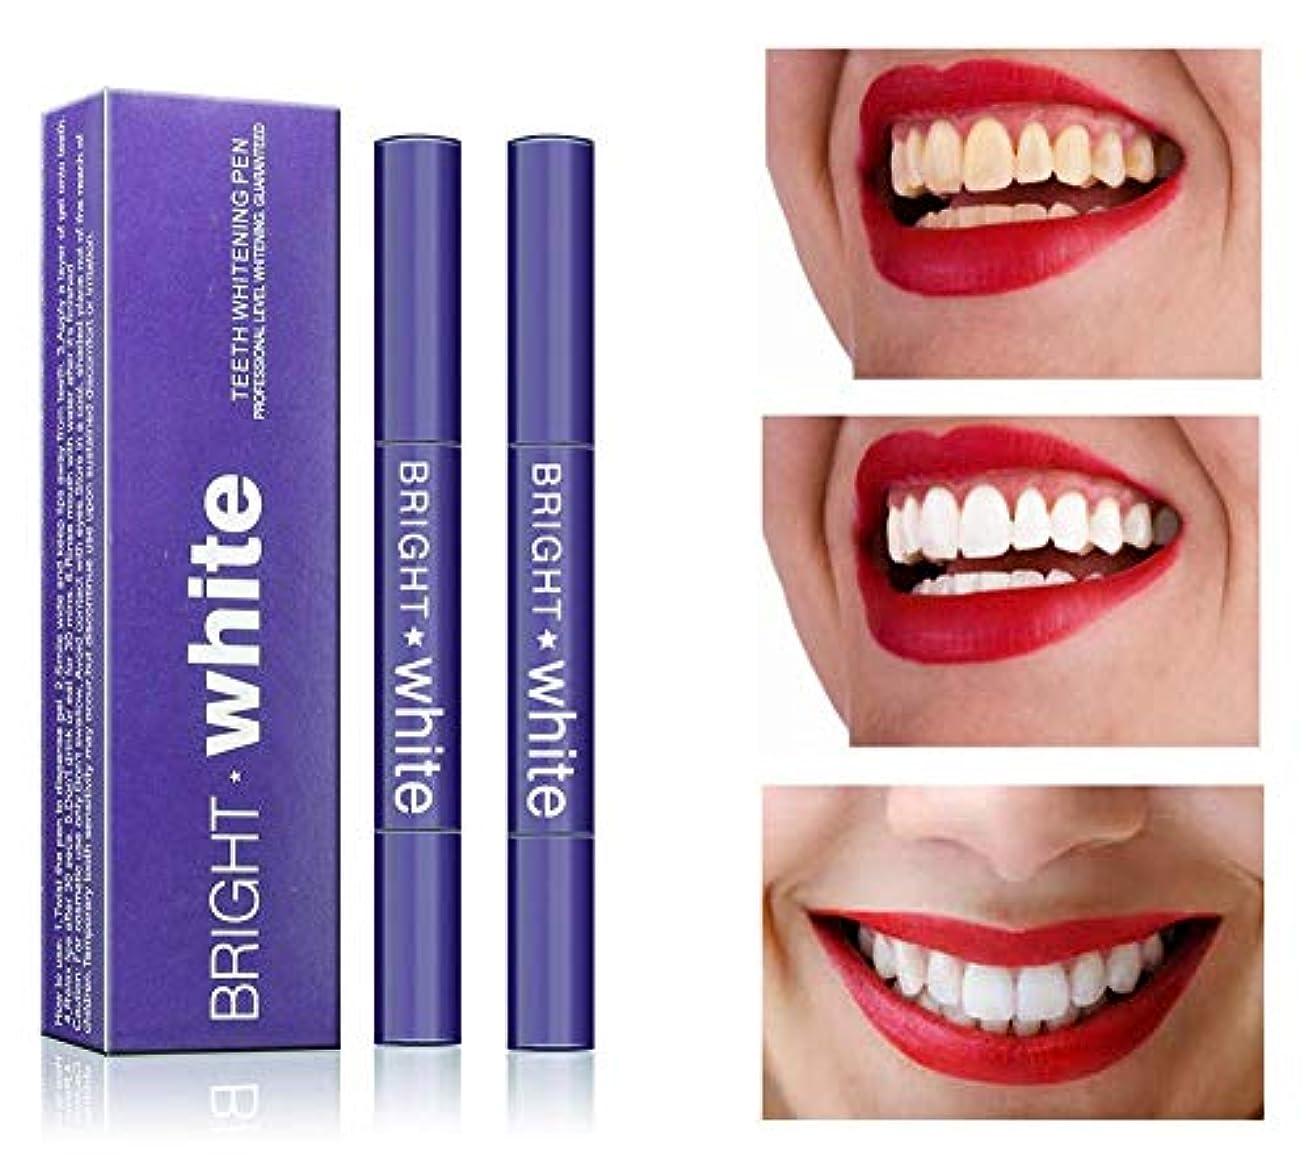 Odette 2019 歯のホワイトニング 美白歯ゲル 歯 ホワイトニングペン ホワイトニングペン 歯ブラシ 輝く笑顔 口臭防止 歯周病防止 (#02)